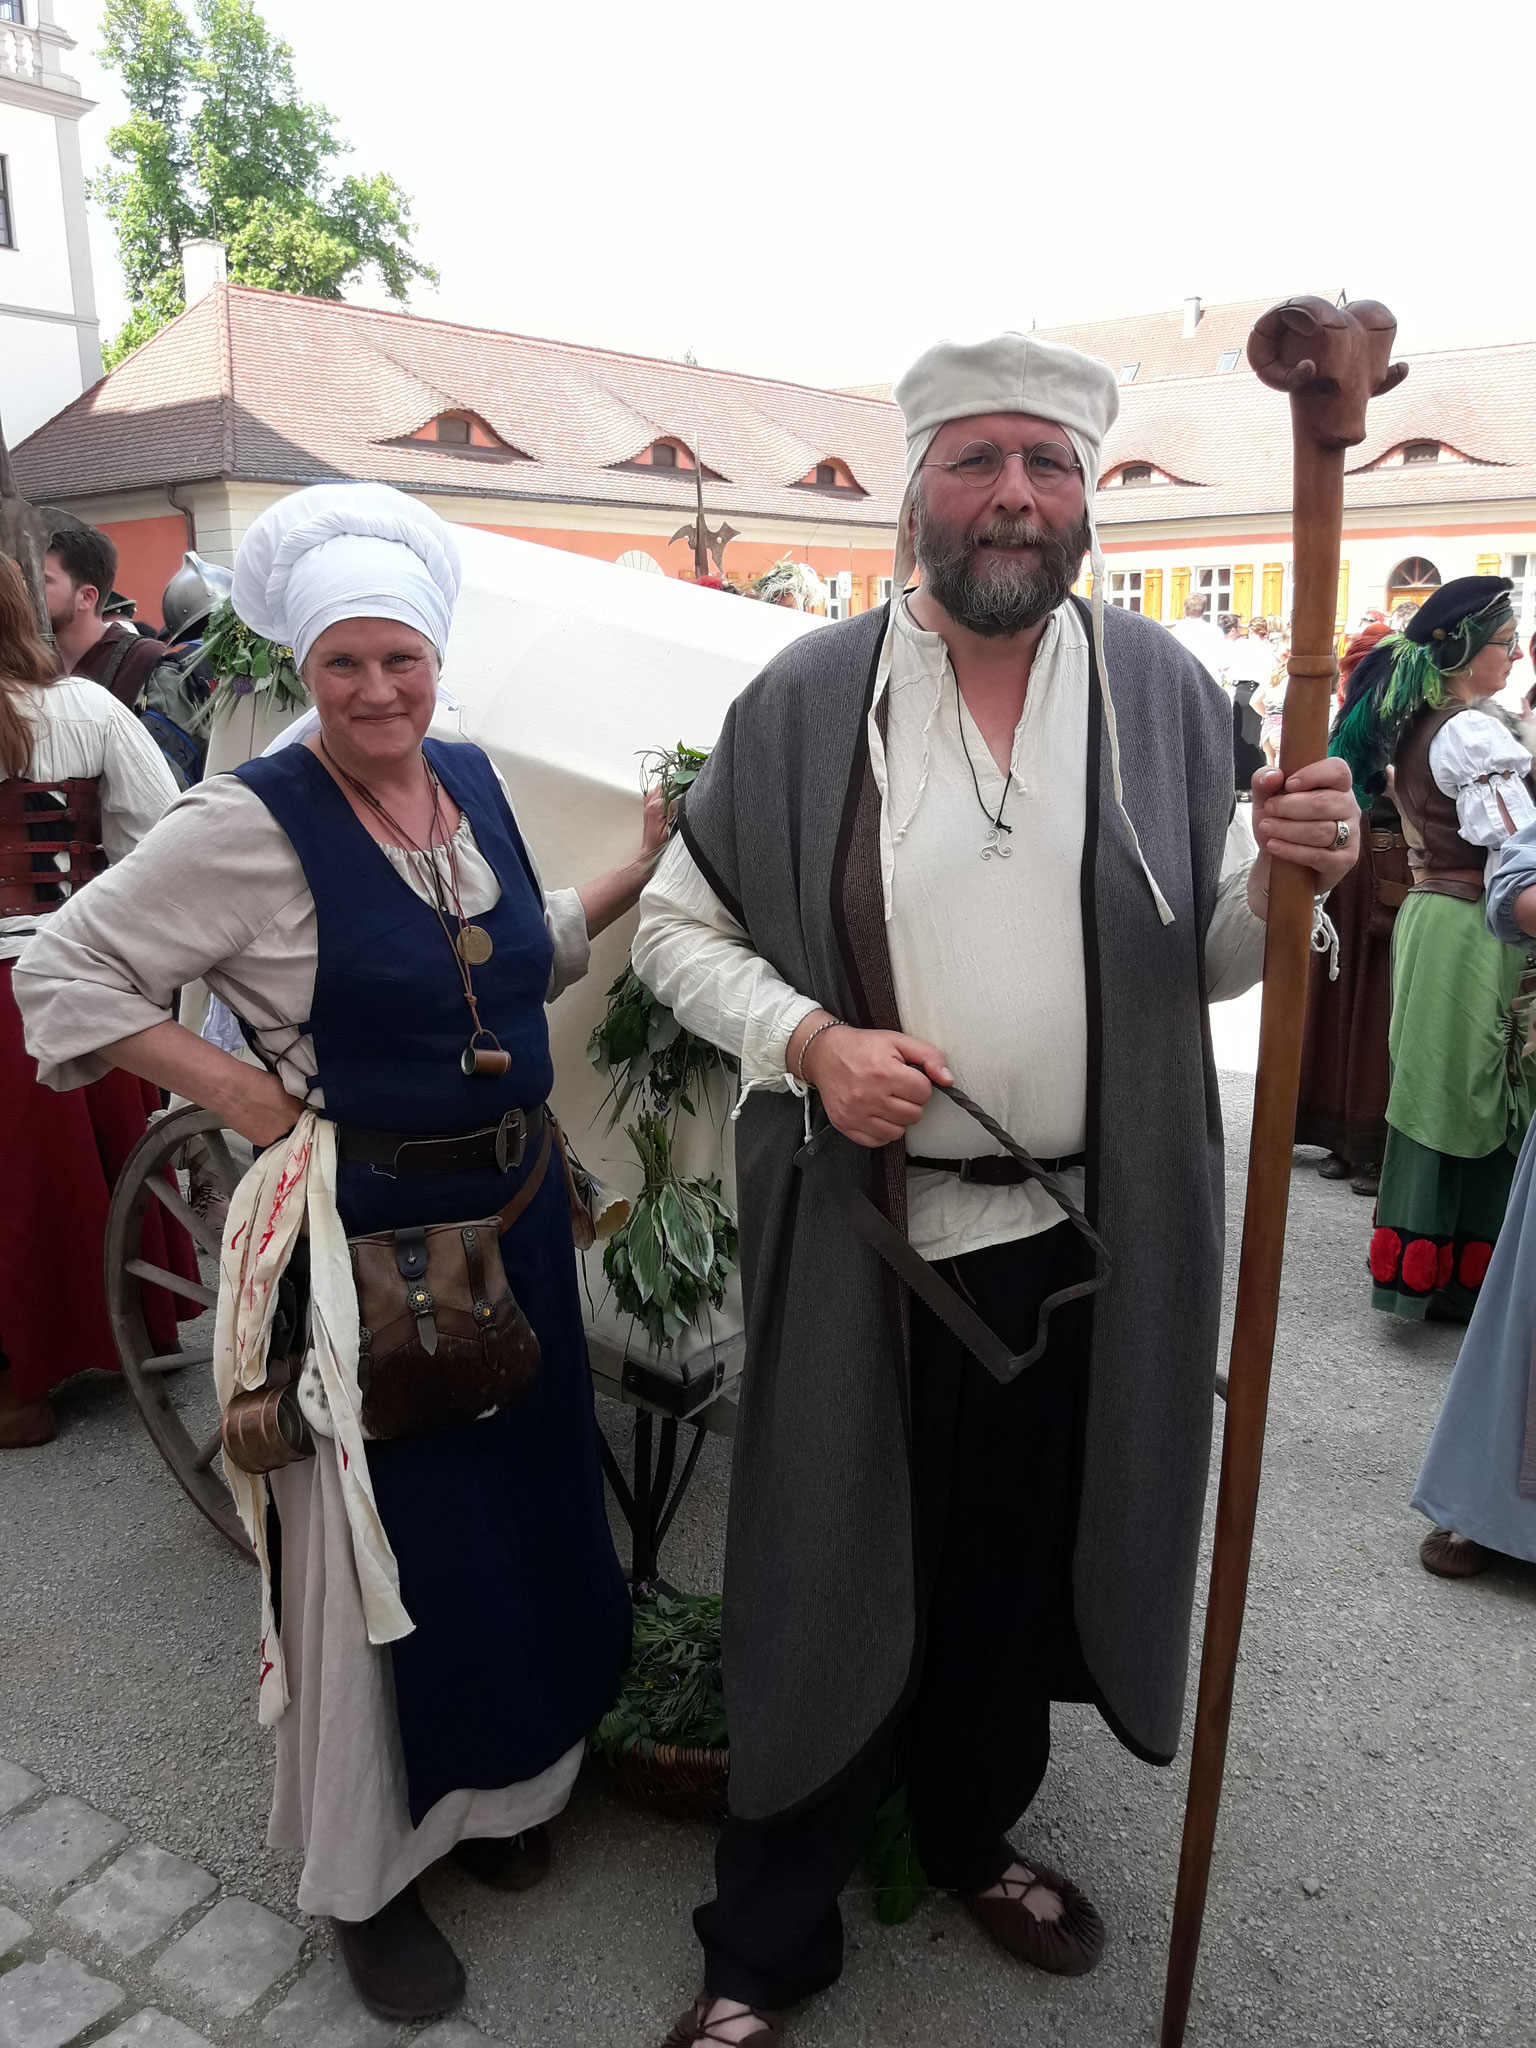 11.-13.05.18: Historischer Markt Öttingen